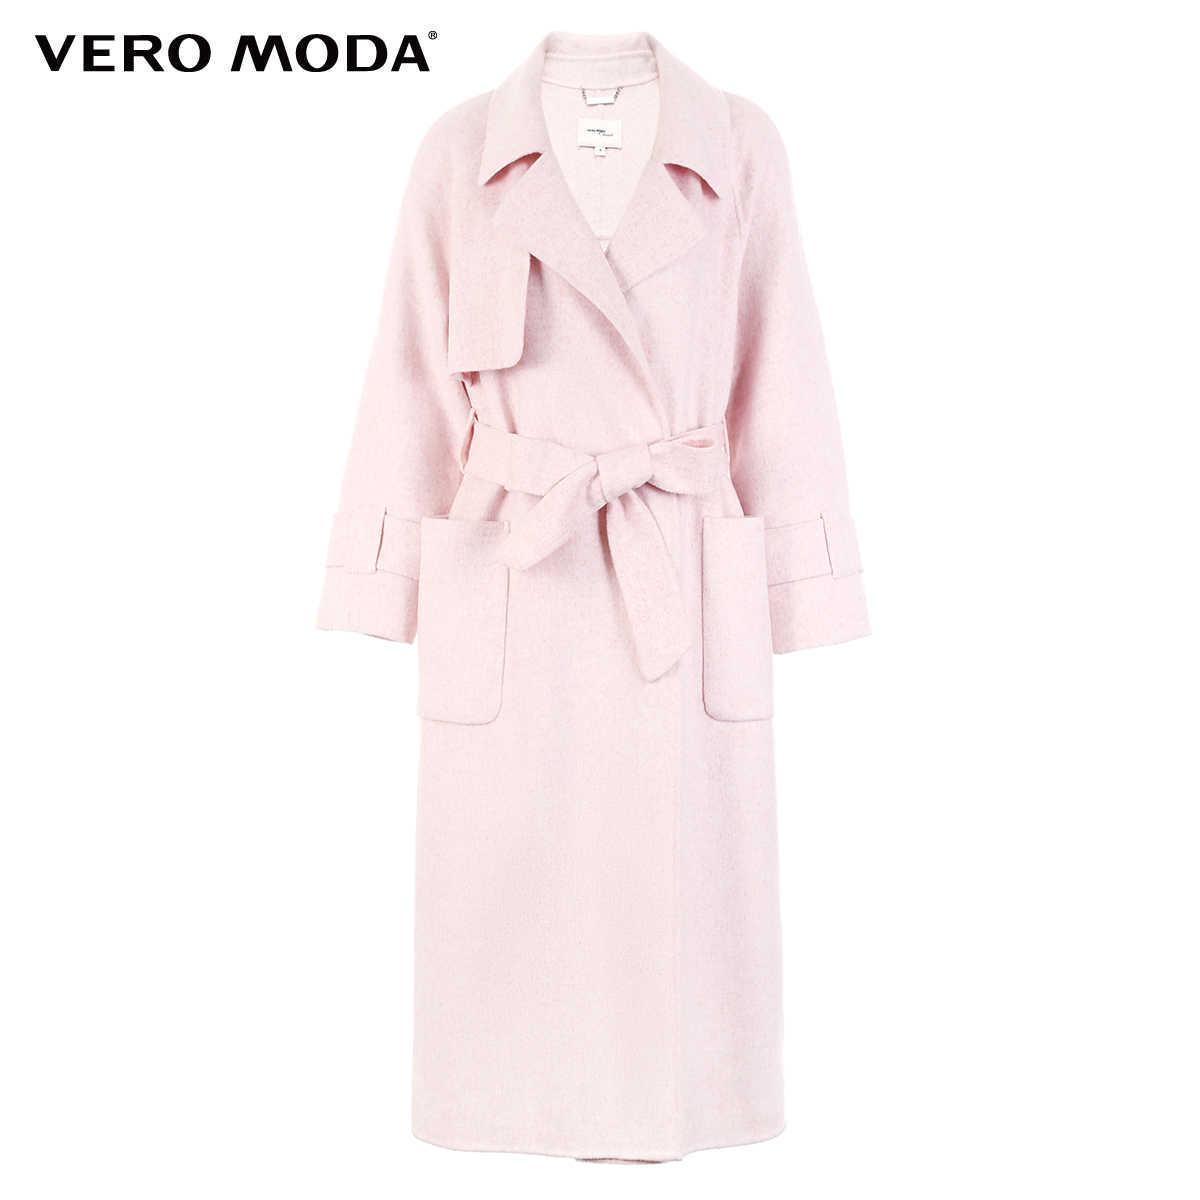 Vero Moda Vrouwen 61.3% Wol Blend Pure Dubbele Geconfronteerd Jas   318327508